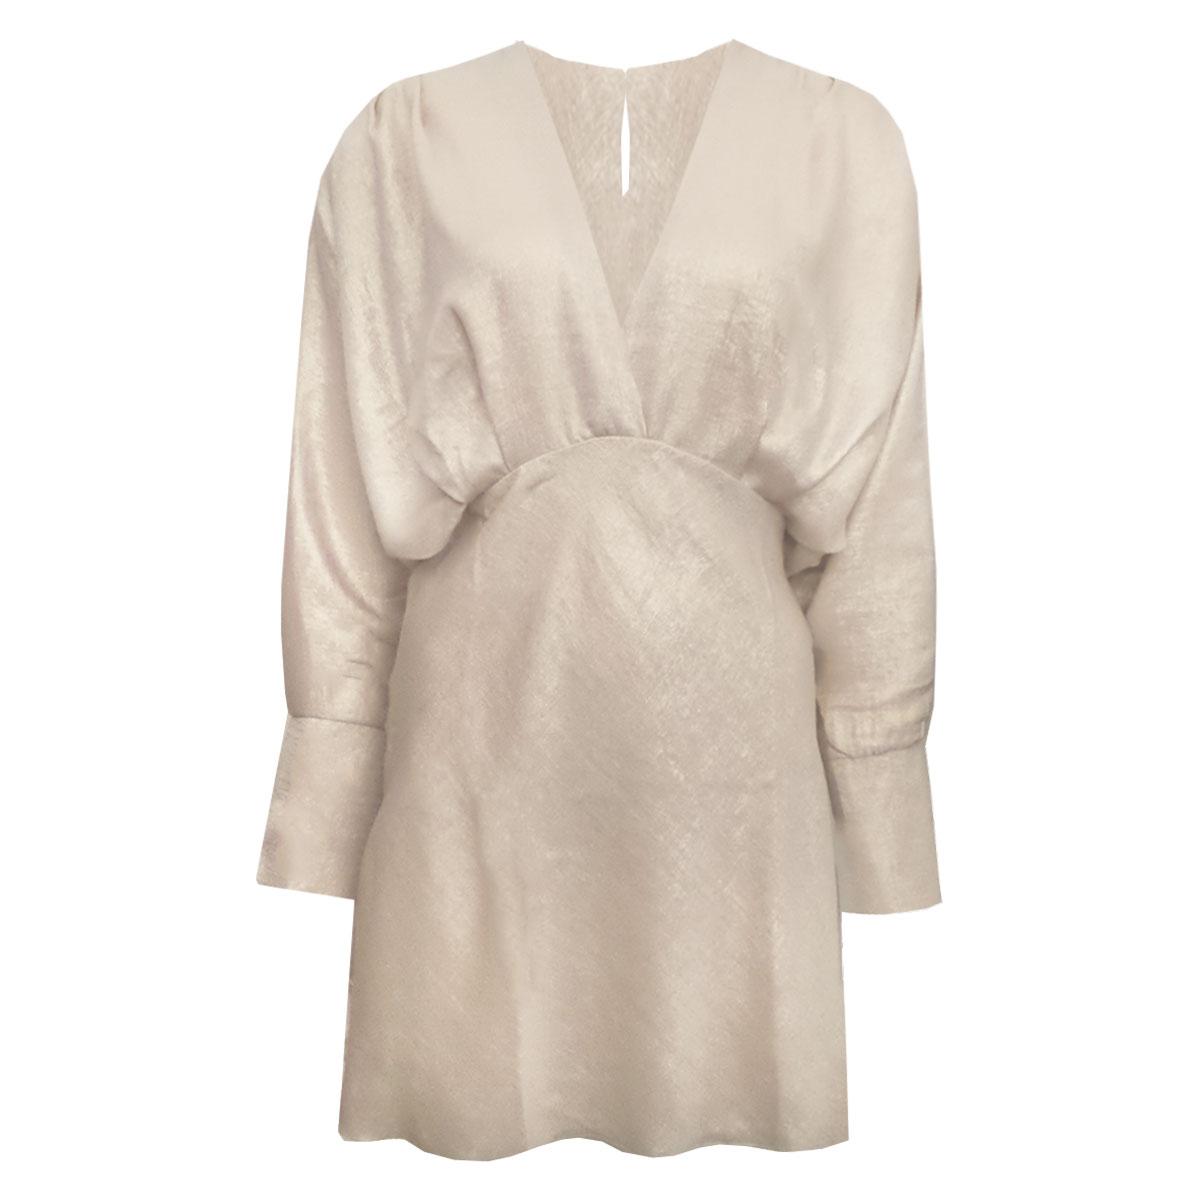 SPARKLE DRESS CHAMPAGNE NEW